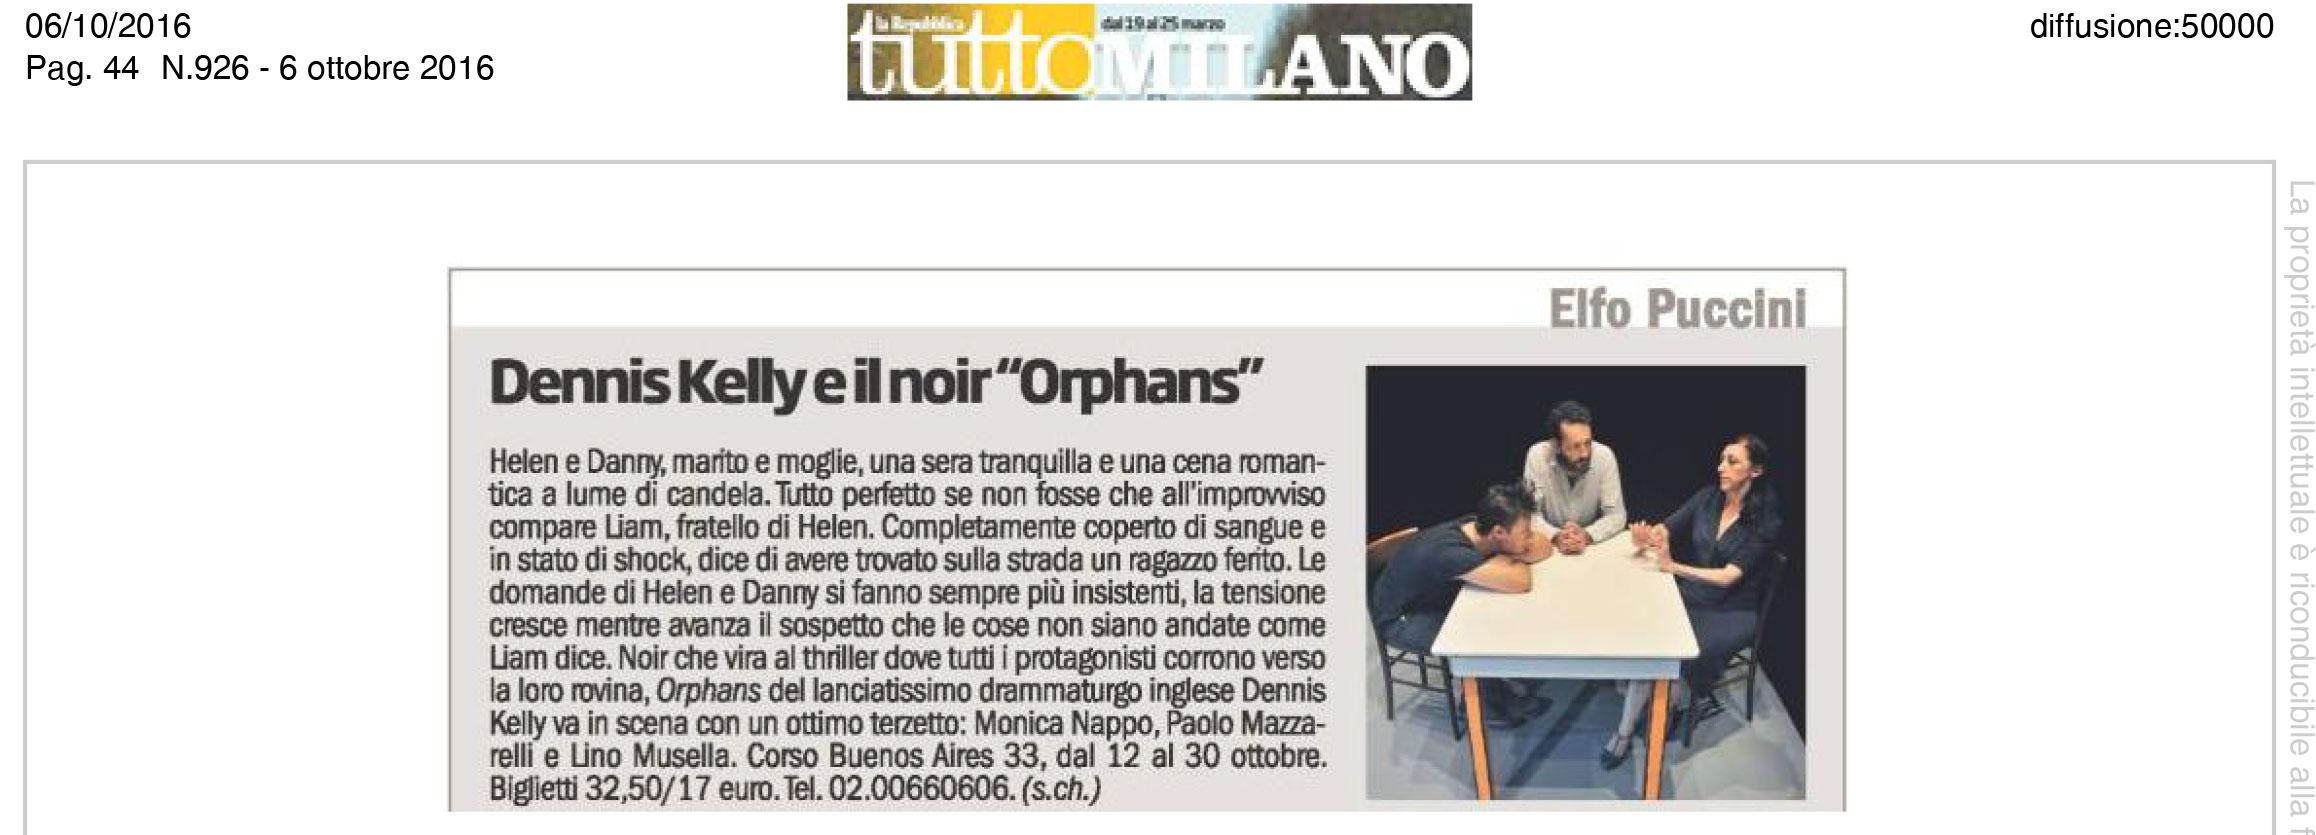 20161006_dennis-kelly-e-il-noir-orphans_tuttomilano